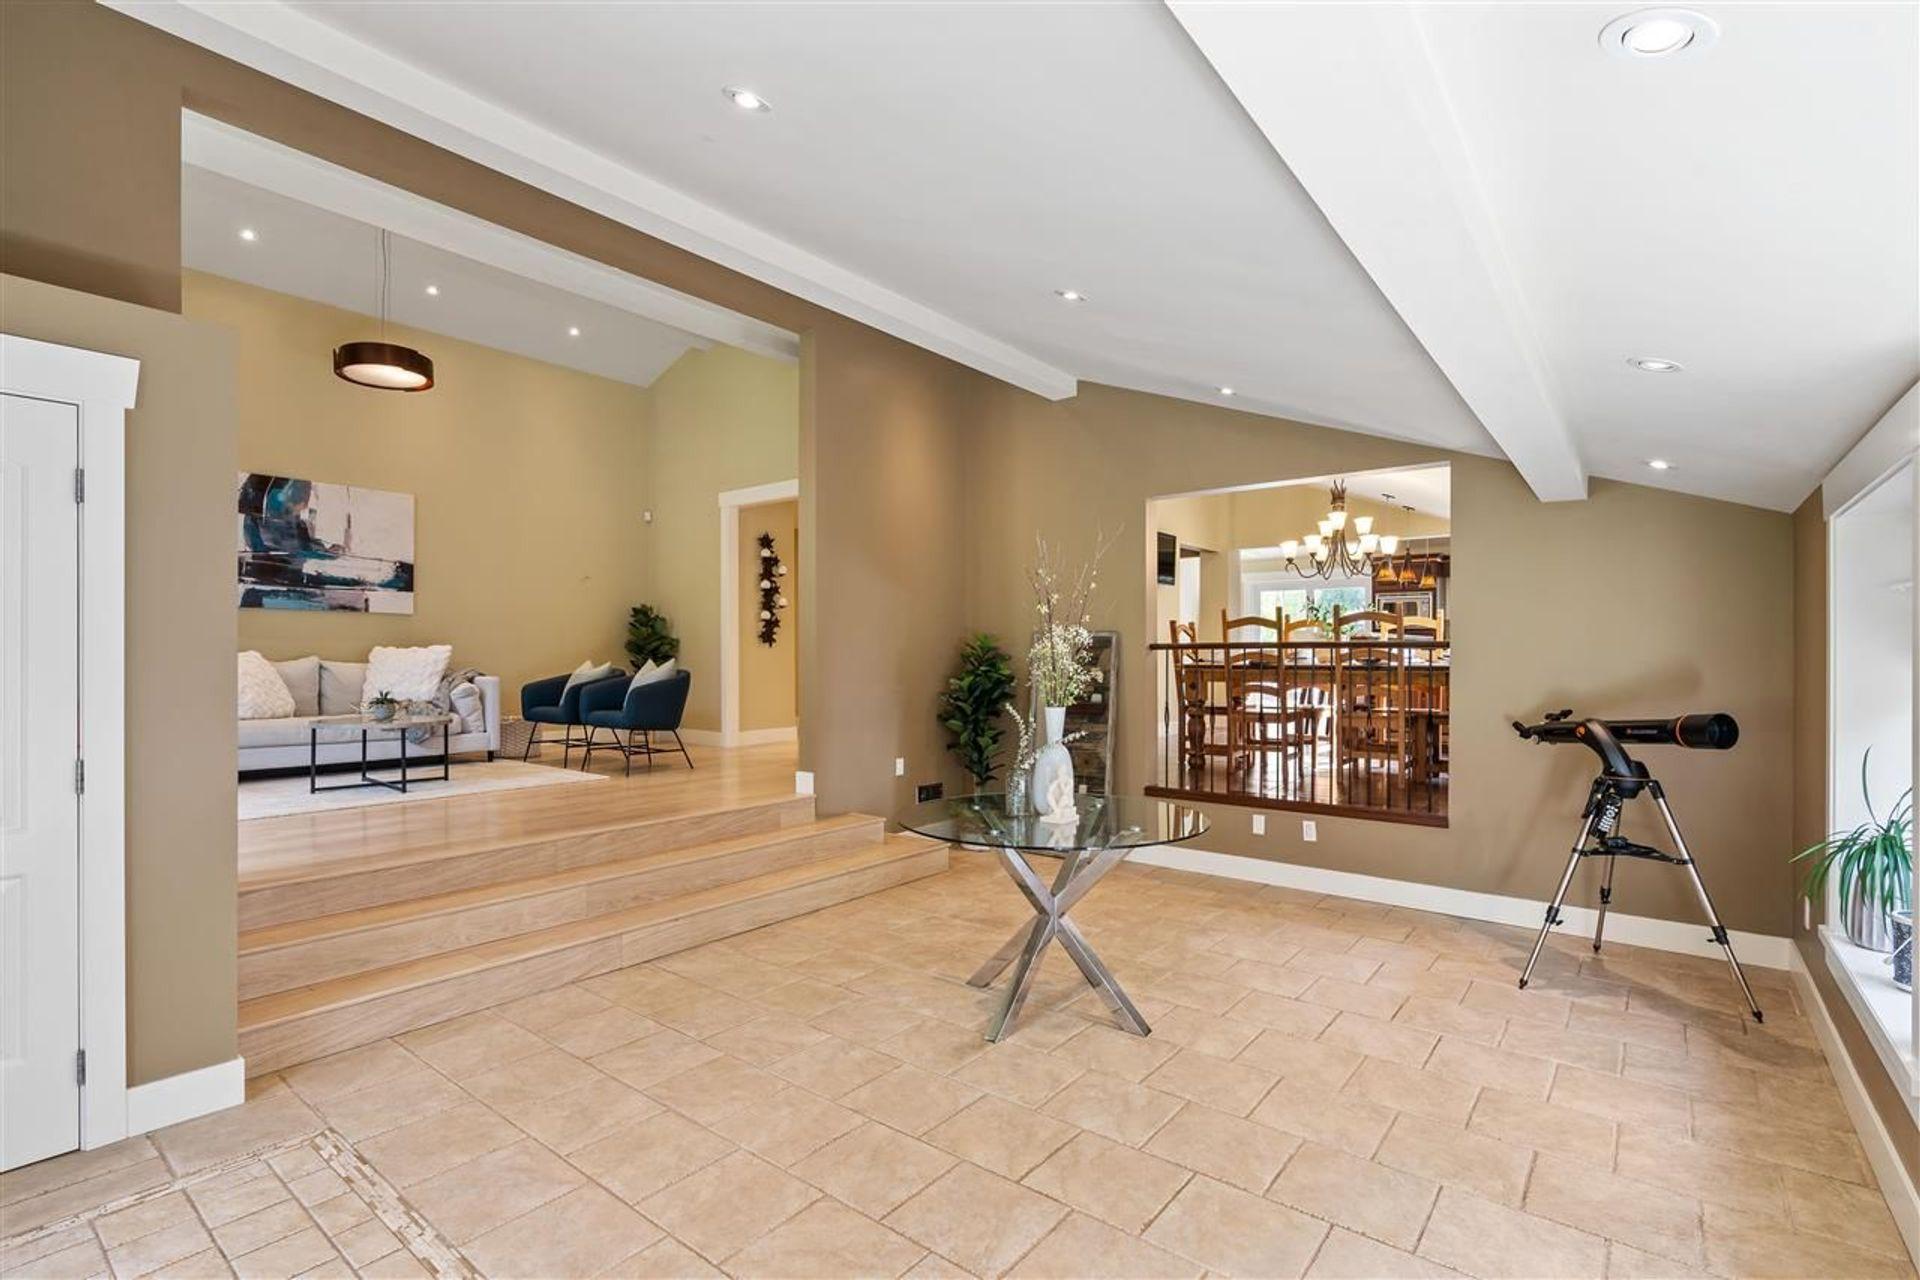 24852-ferguson-avenue-cottonwood-mr-maple-ridge-07 of 24852 Ferguson Avenue, Cottonwood MR, Maple Ridge